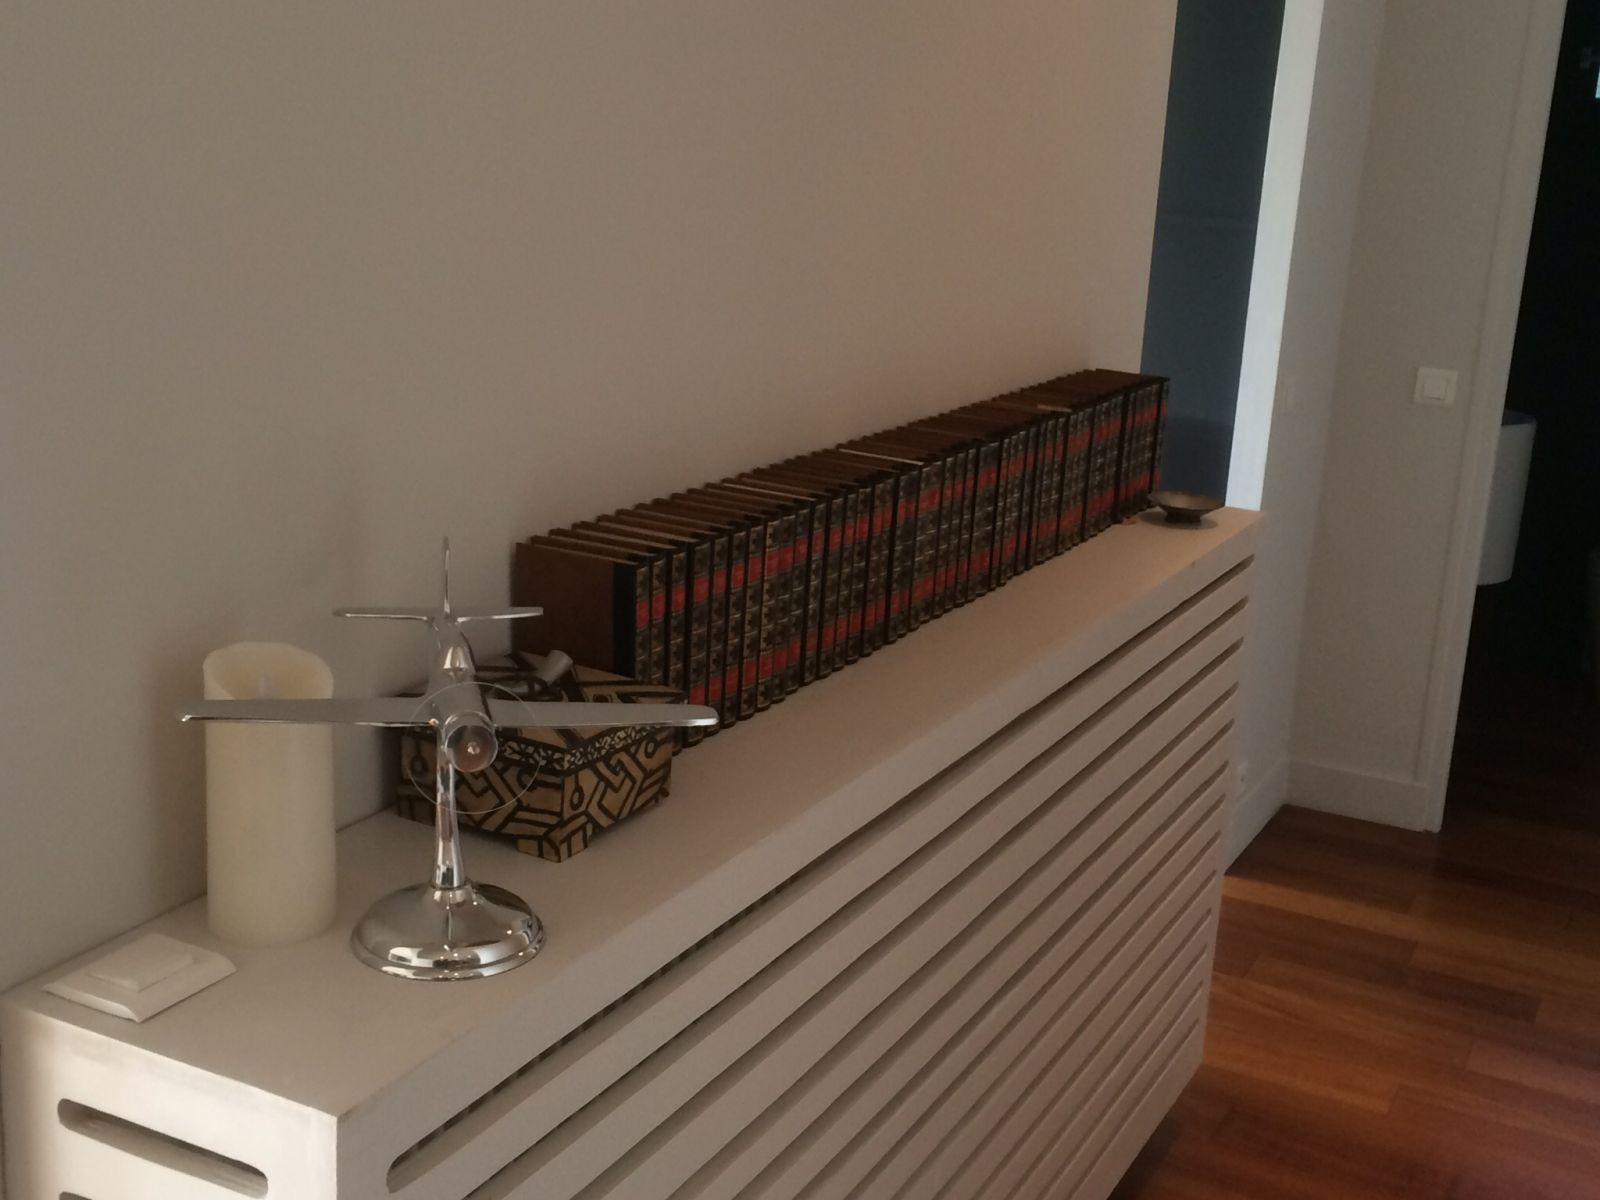 cache radiateur lege cap ferret gironde. Black Bedroom Furniture Sets. Home Design Ideas